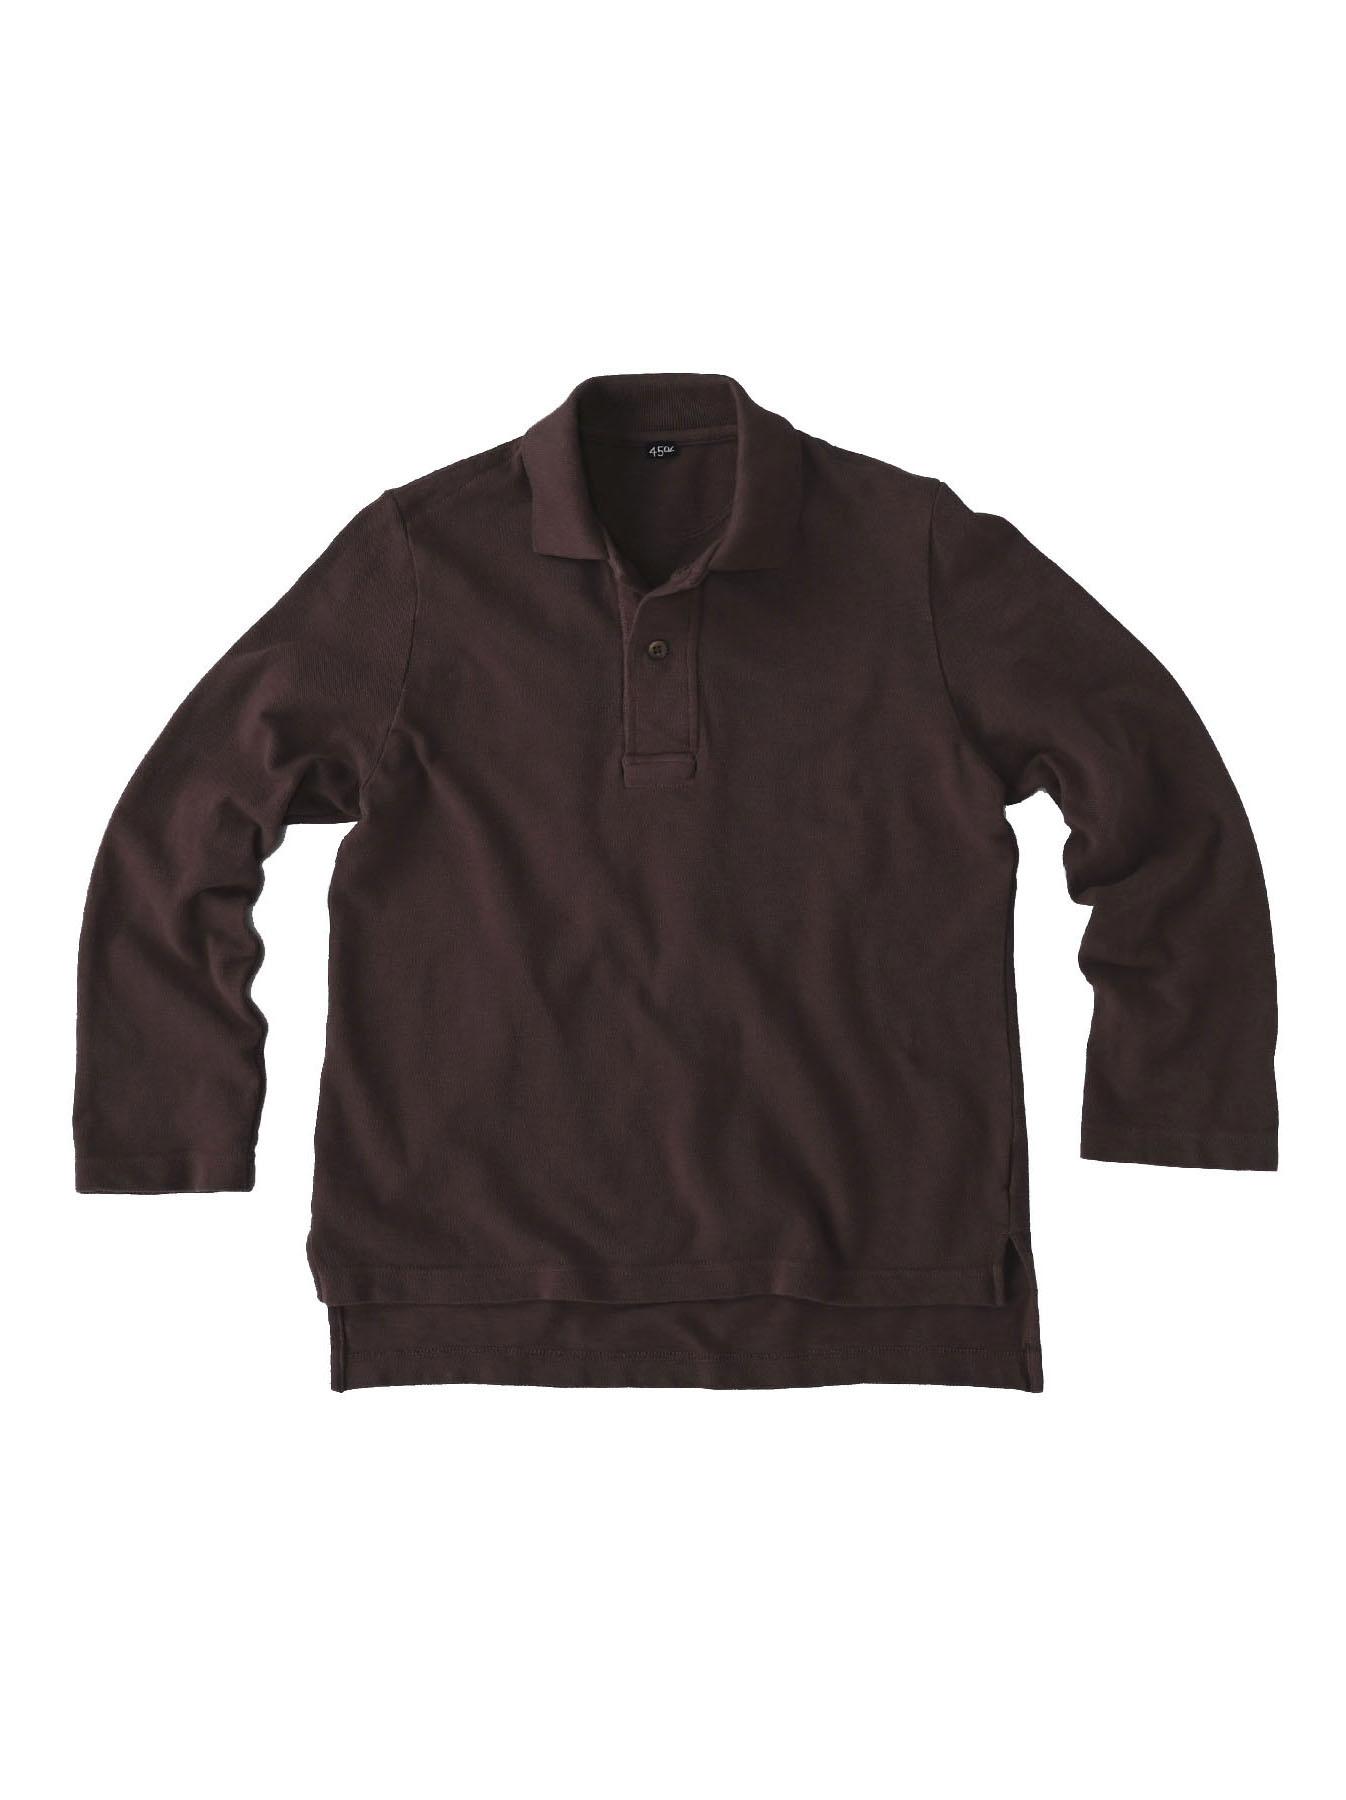 Kanoko Shiokaze Long-sleeved Square Polo Shirt (0521)-7